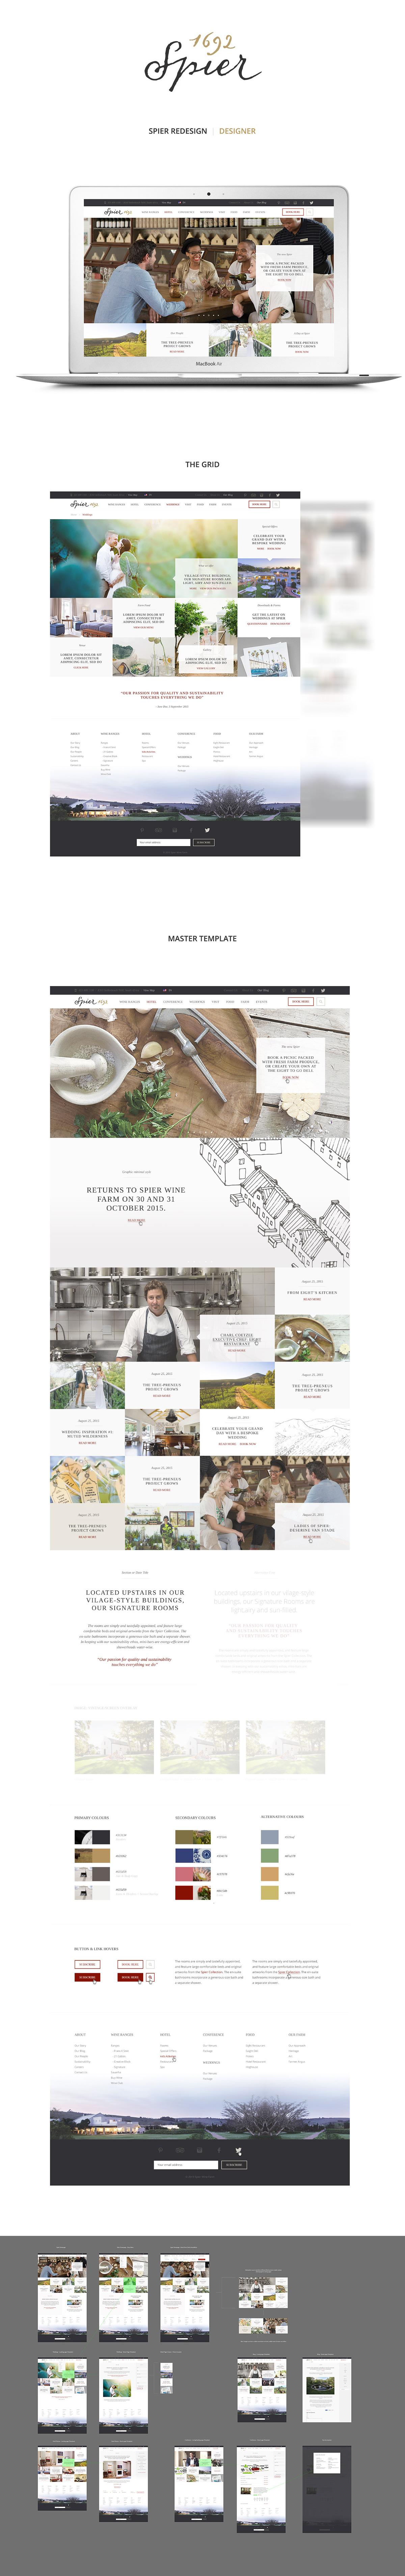 wine cape town Responsive design farm wedding Food